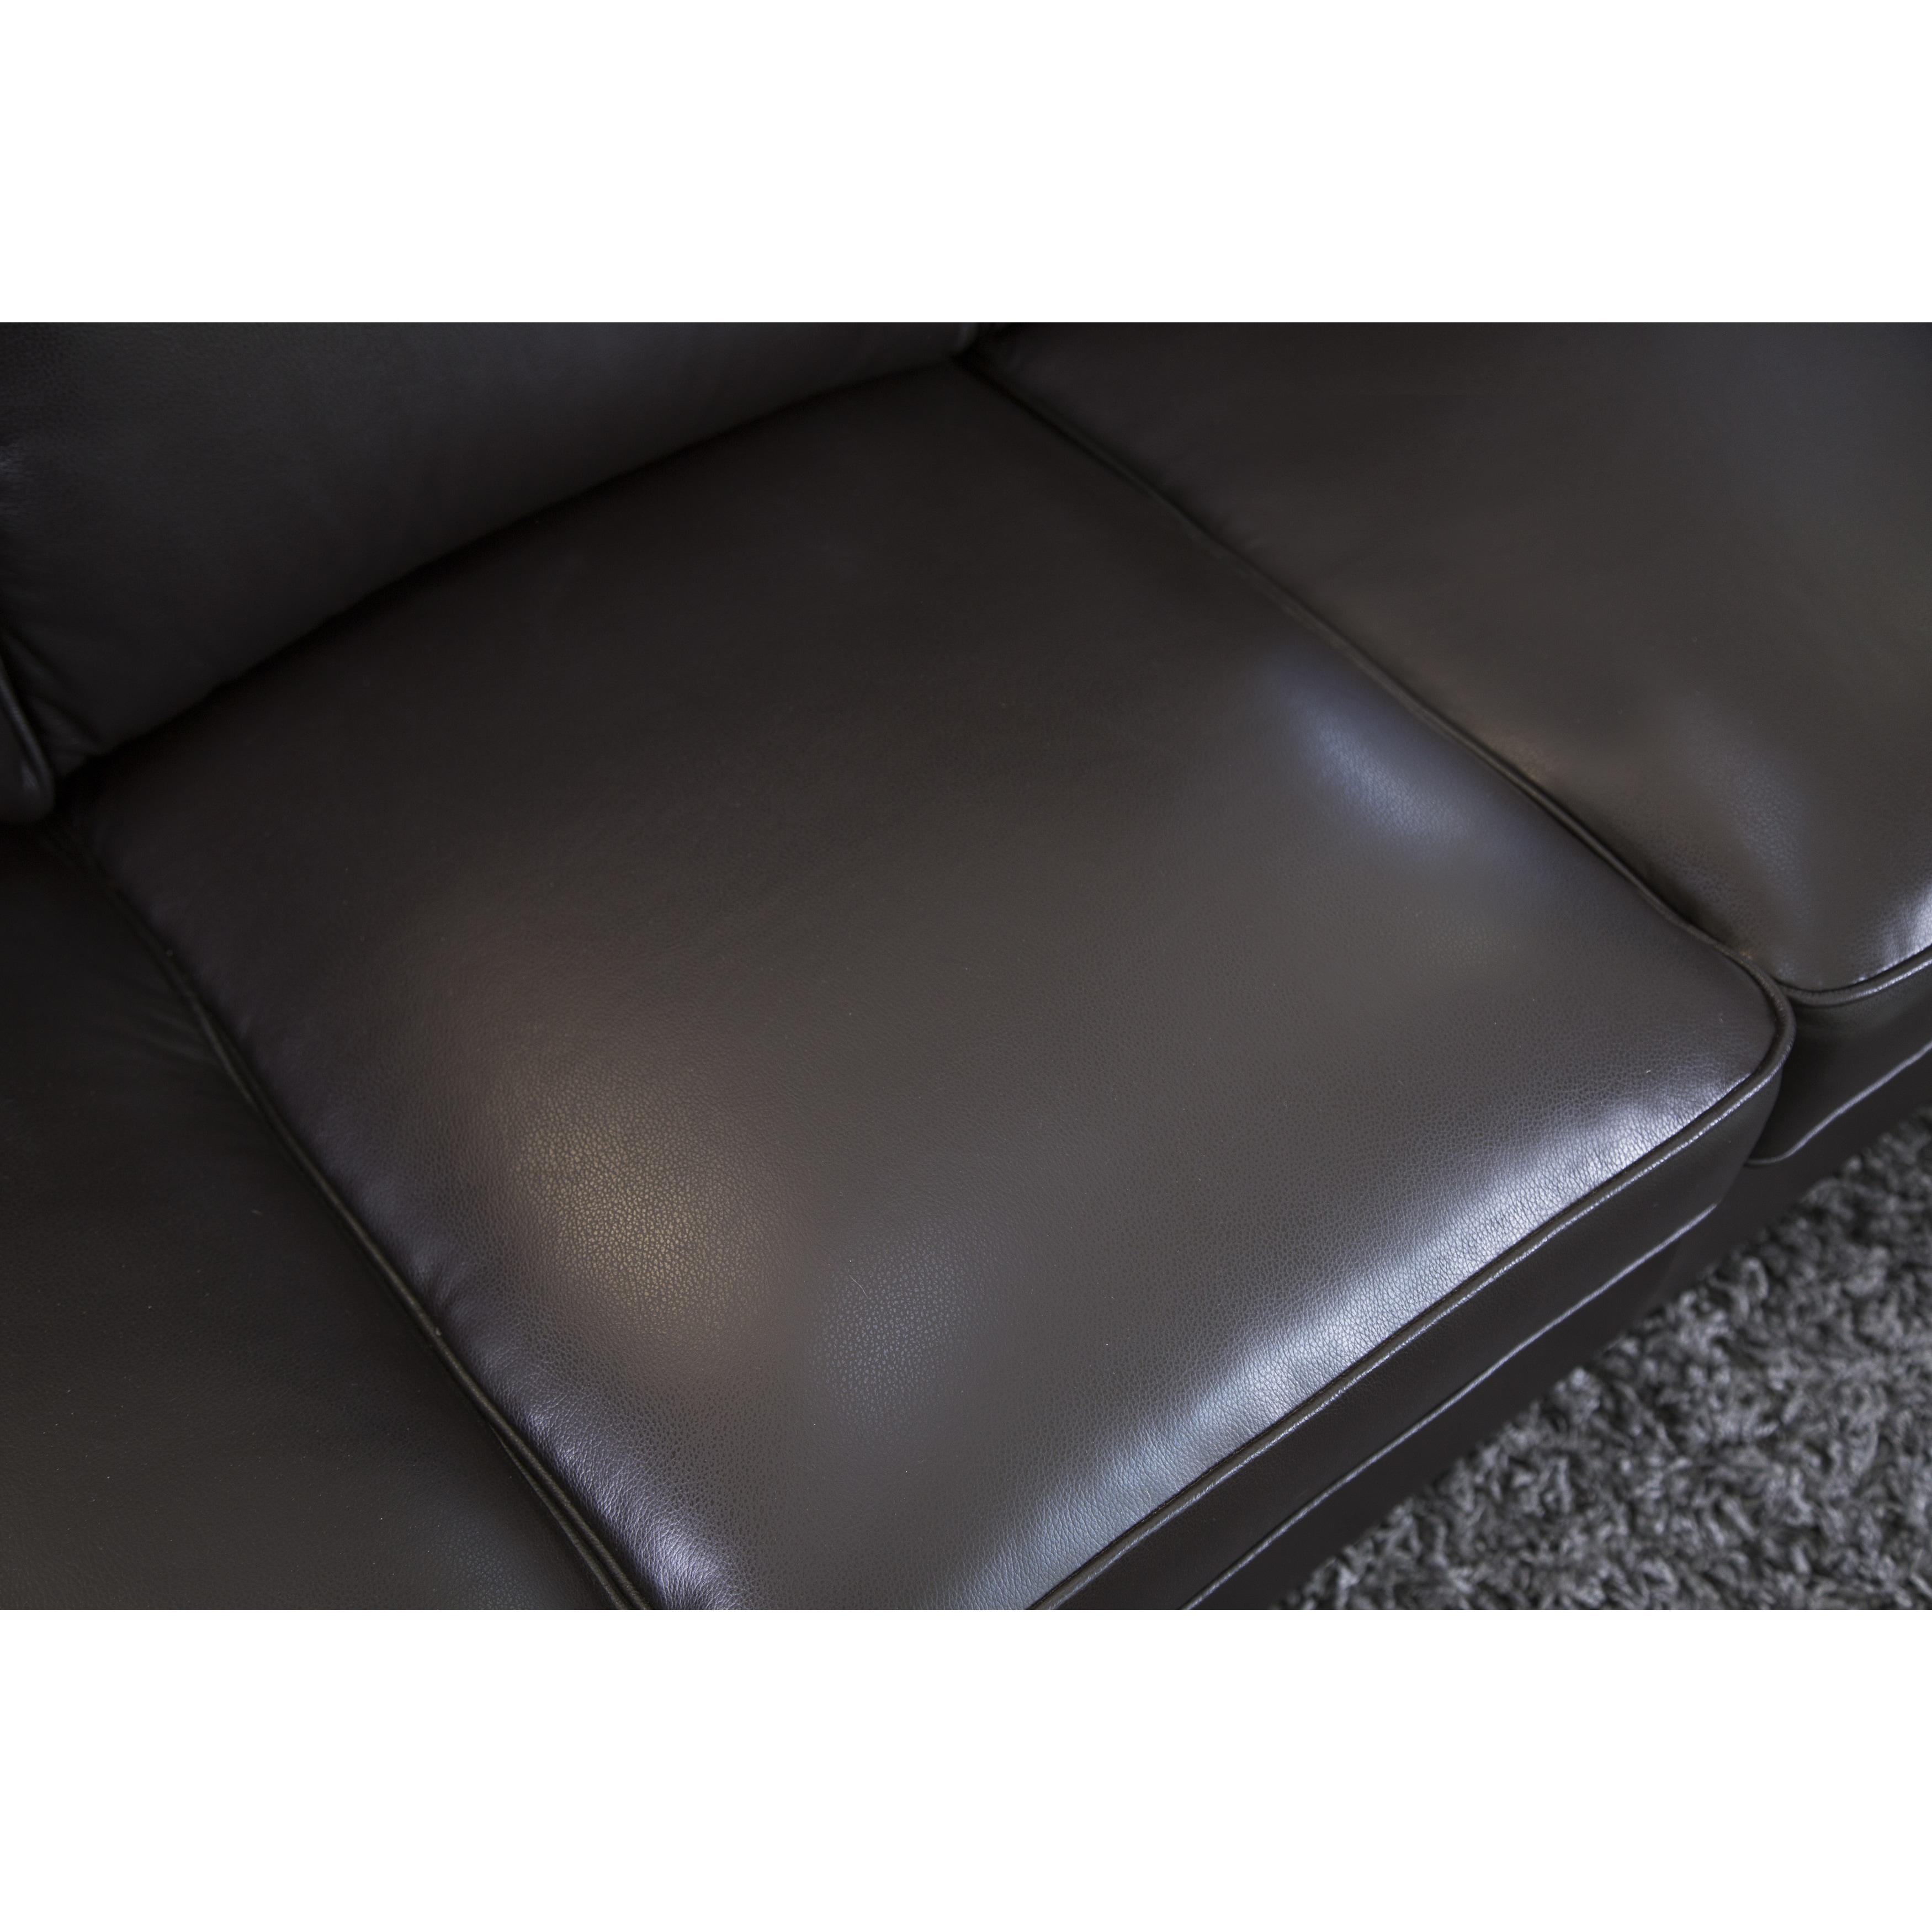 Reupholster Leather Sofa London Sofa Review